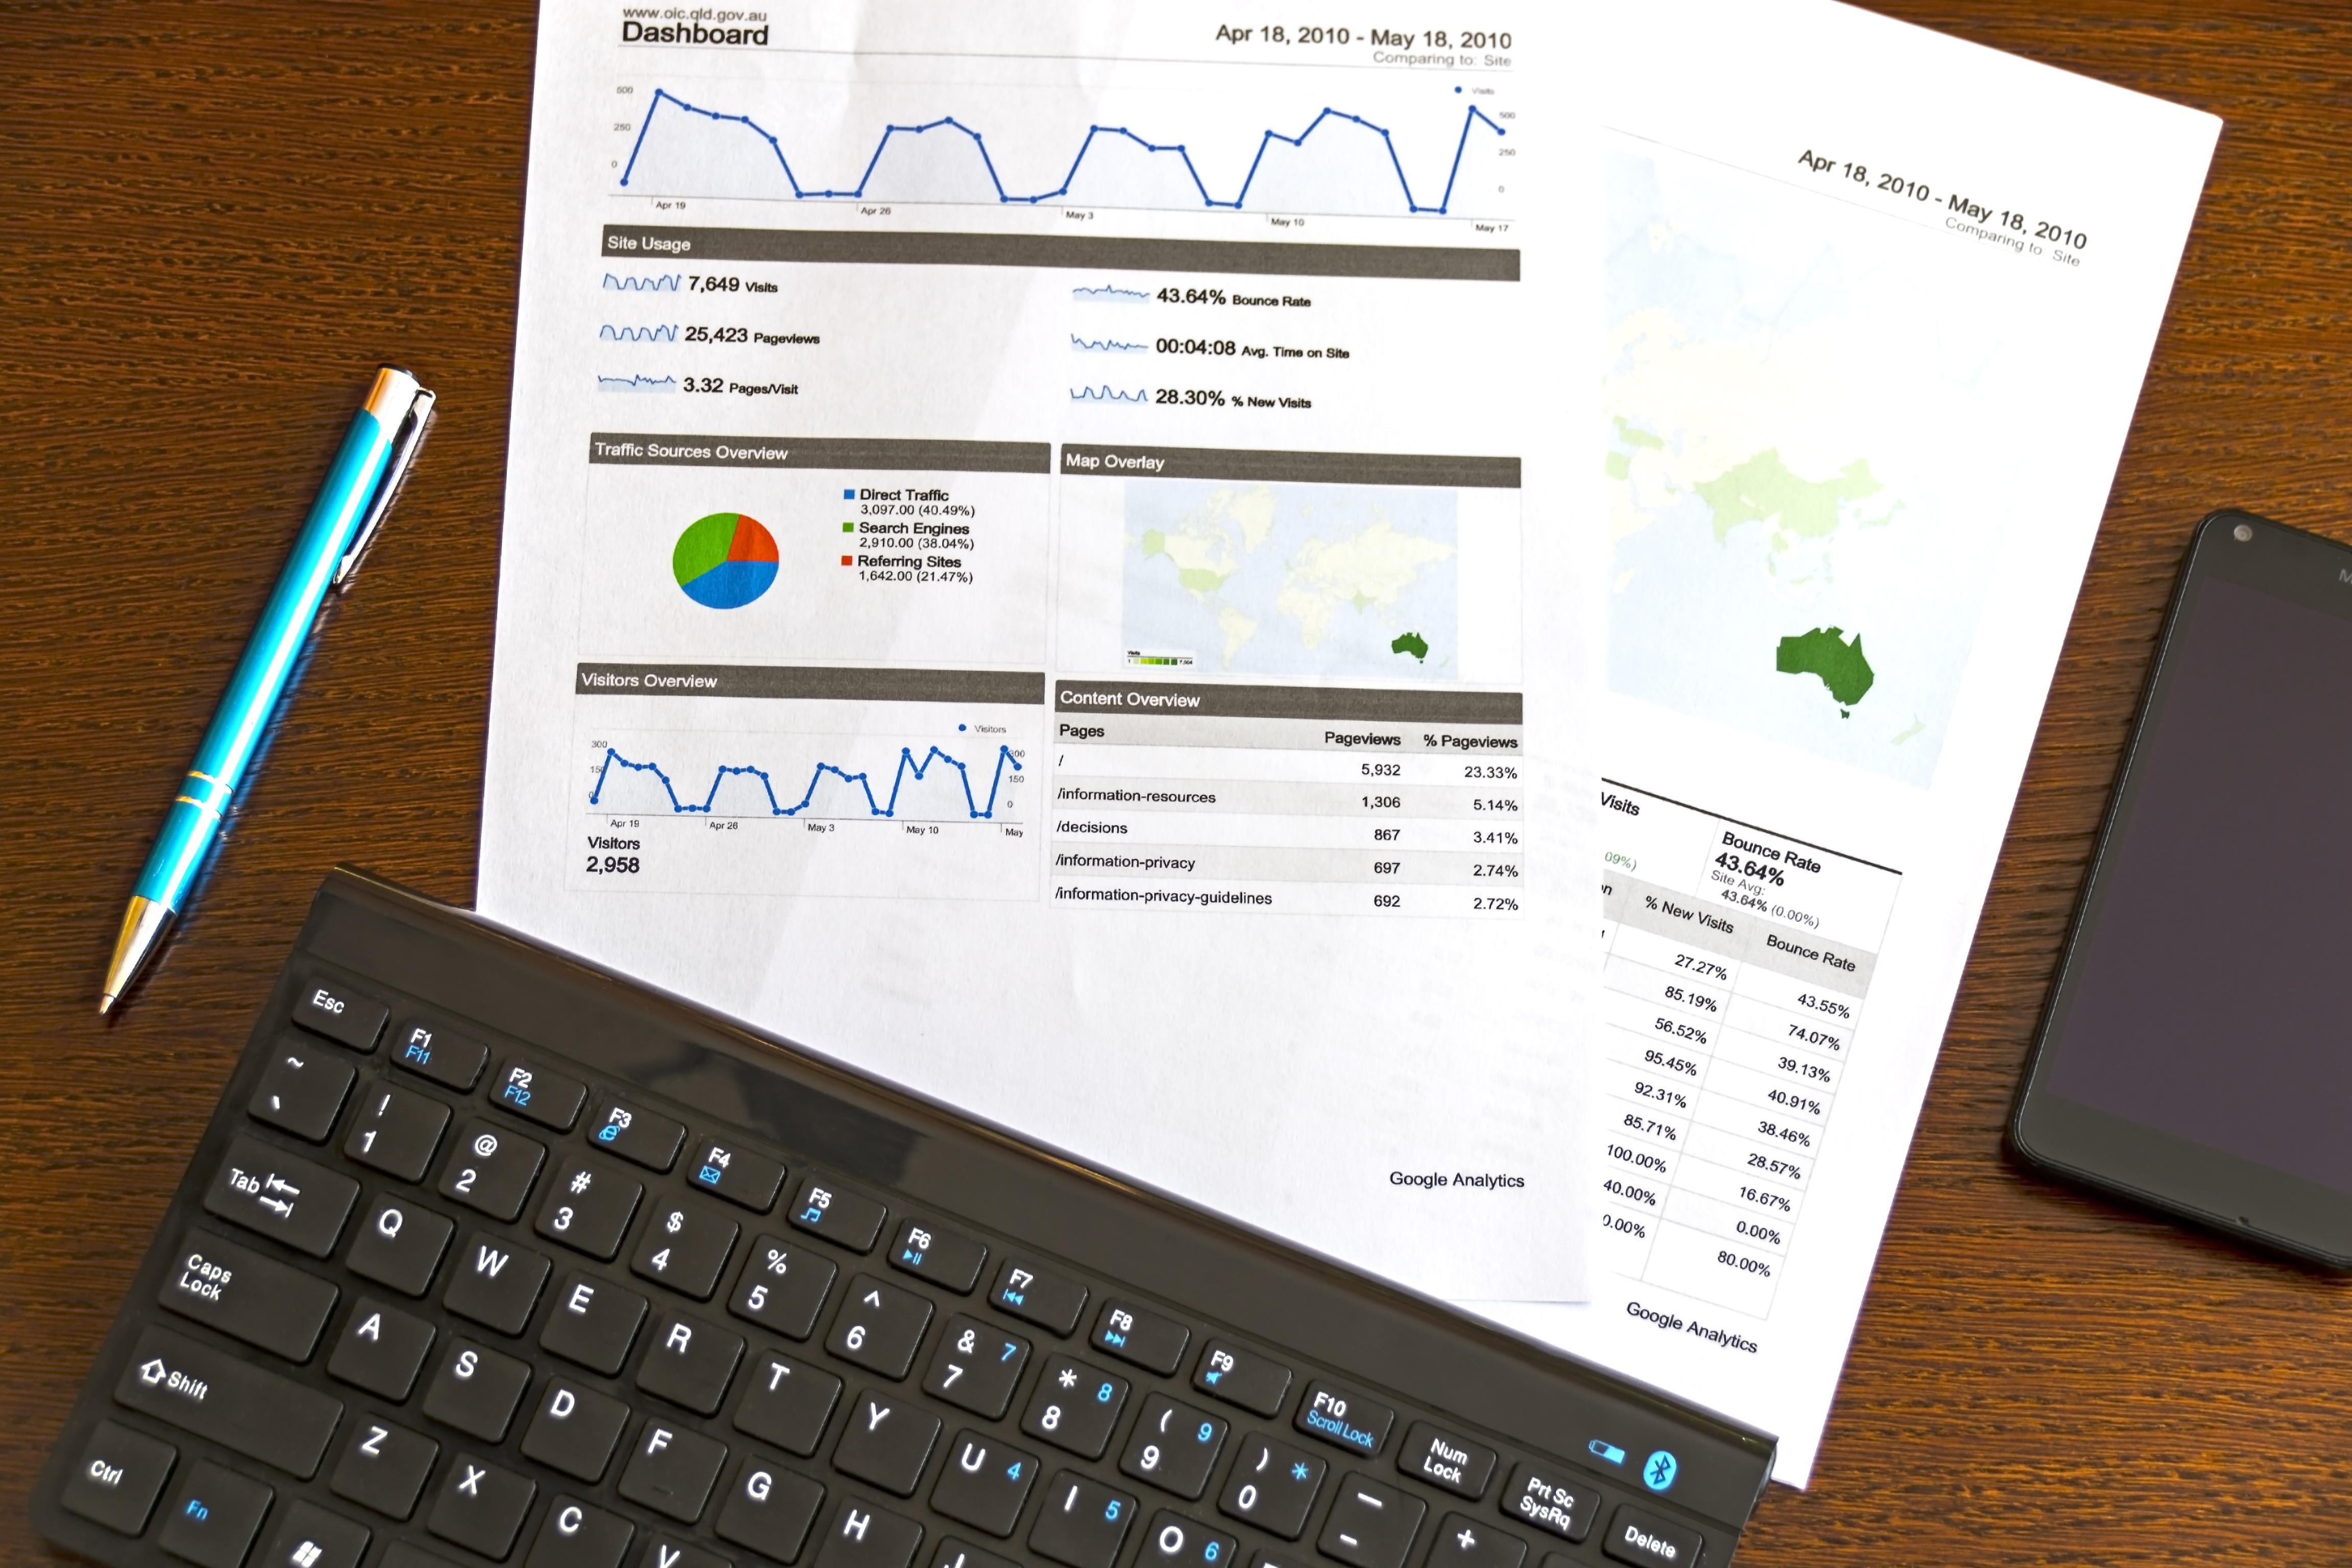 Digital marketing analytics